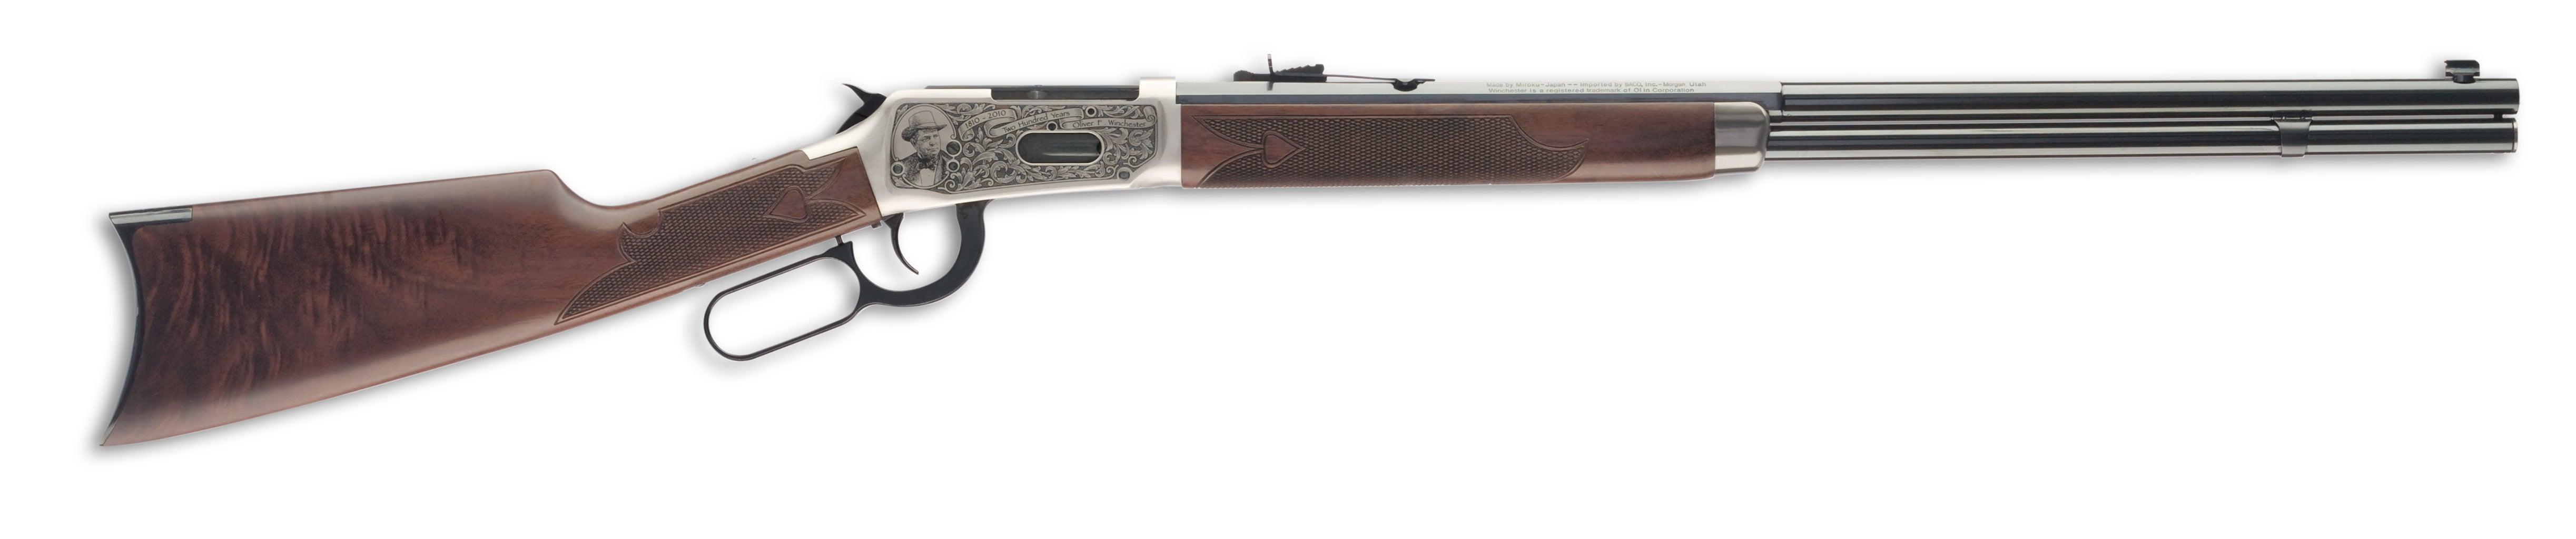 model 94 oliver f winchester high grade